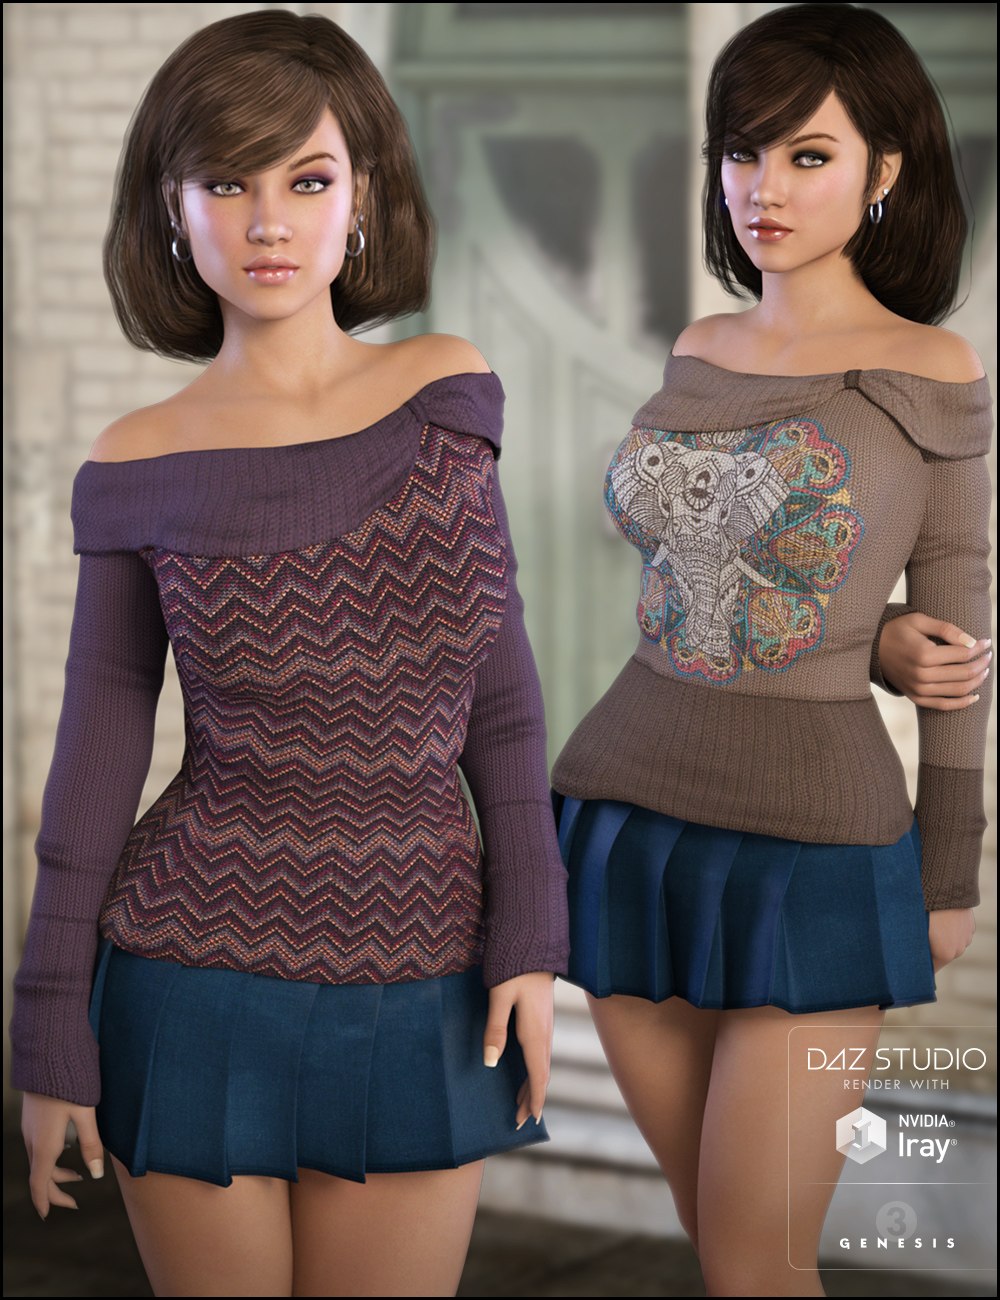 Off Shoulder Sweater Comfy Textures by: Jessaii, 3D Models by Daz 3D